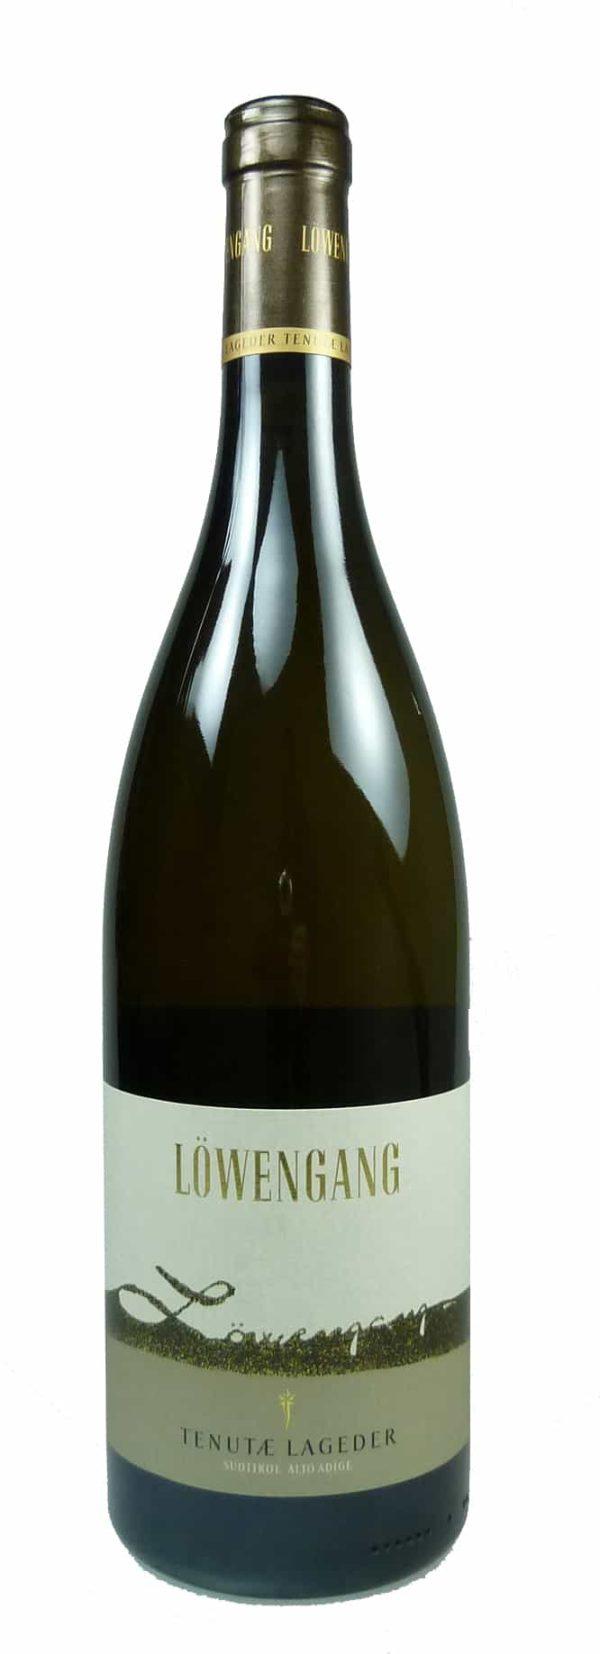 Löwengang Chardonnay Tenutae Lageder 2016